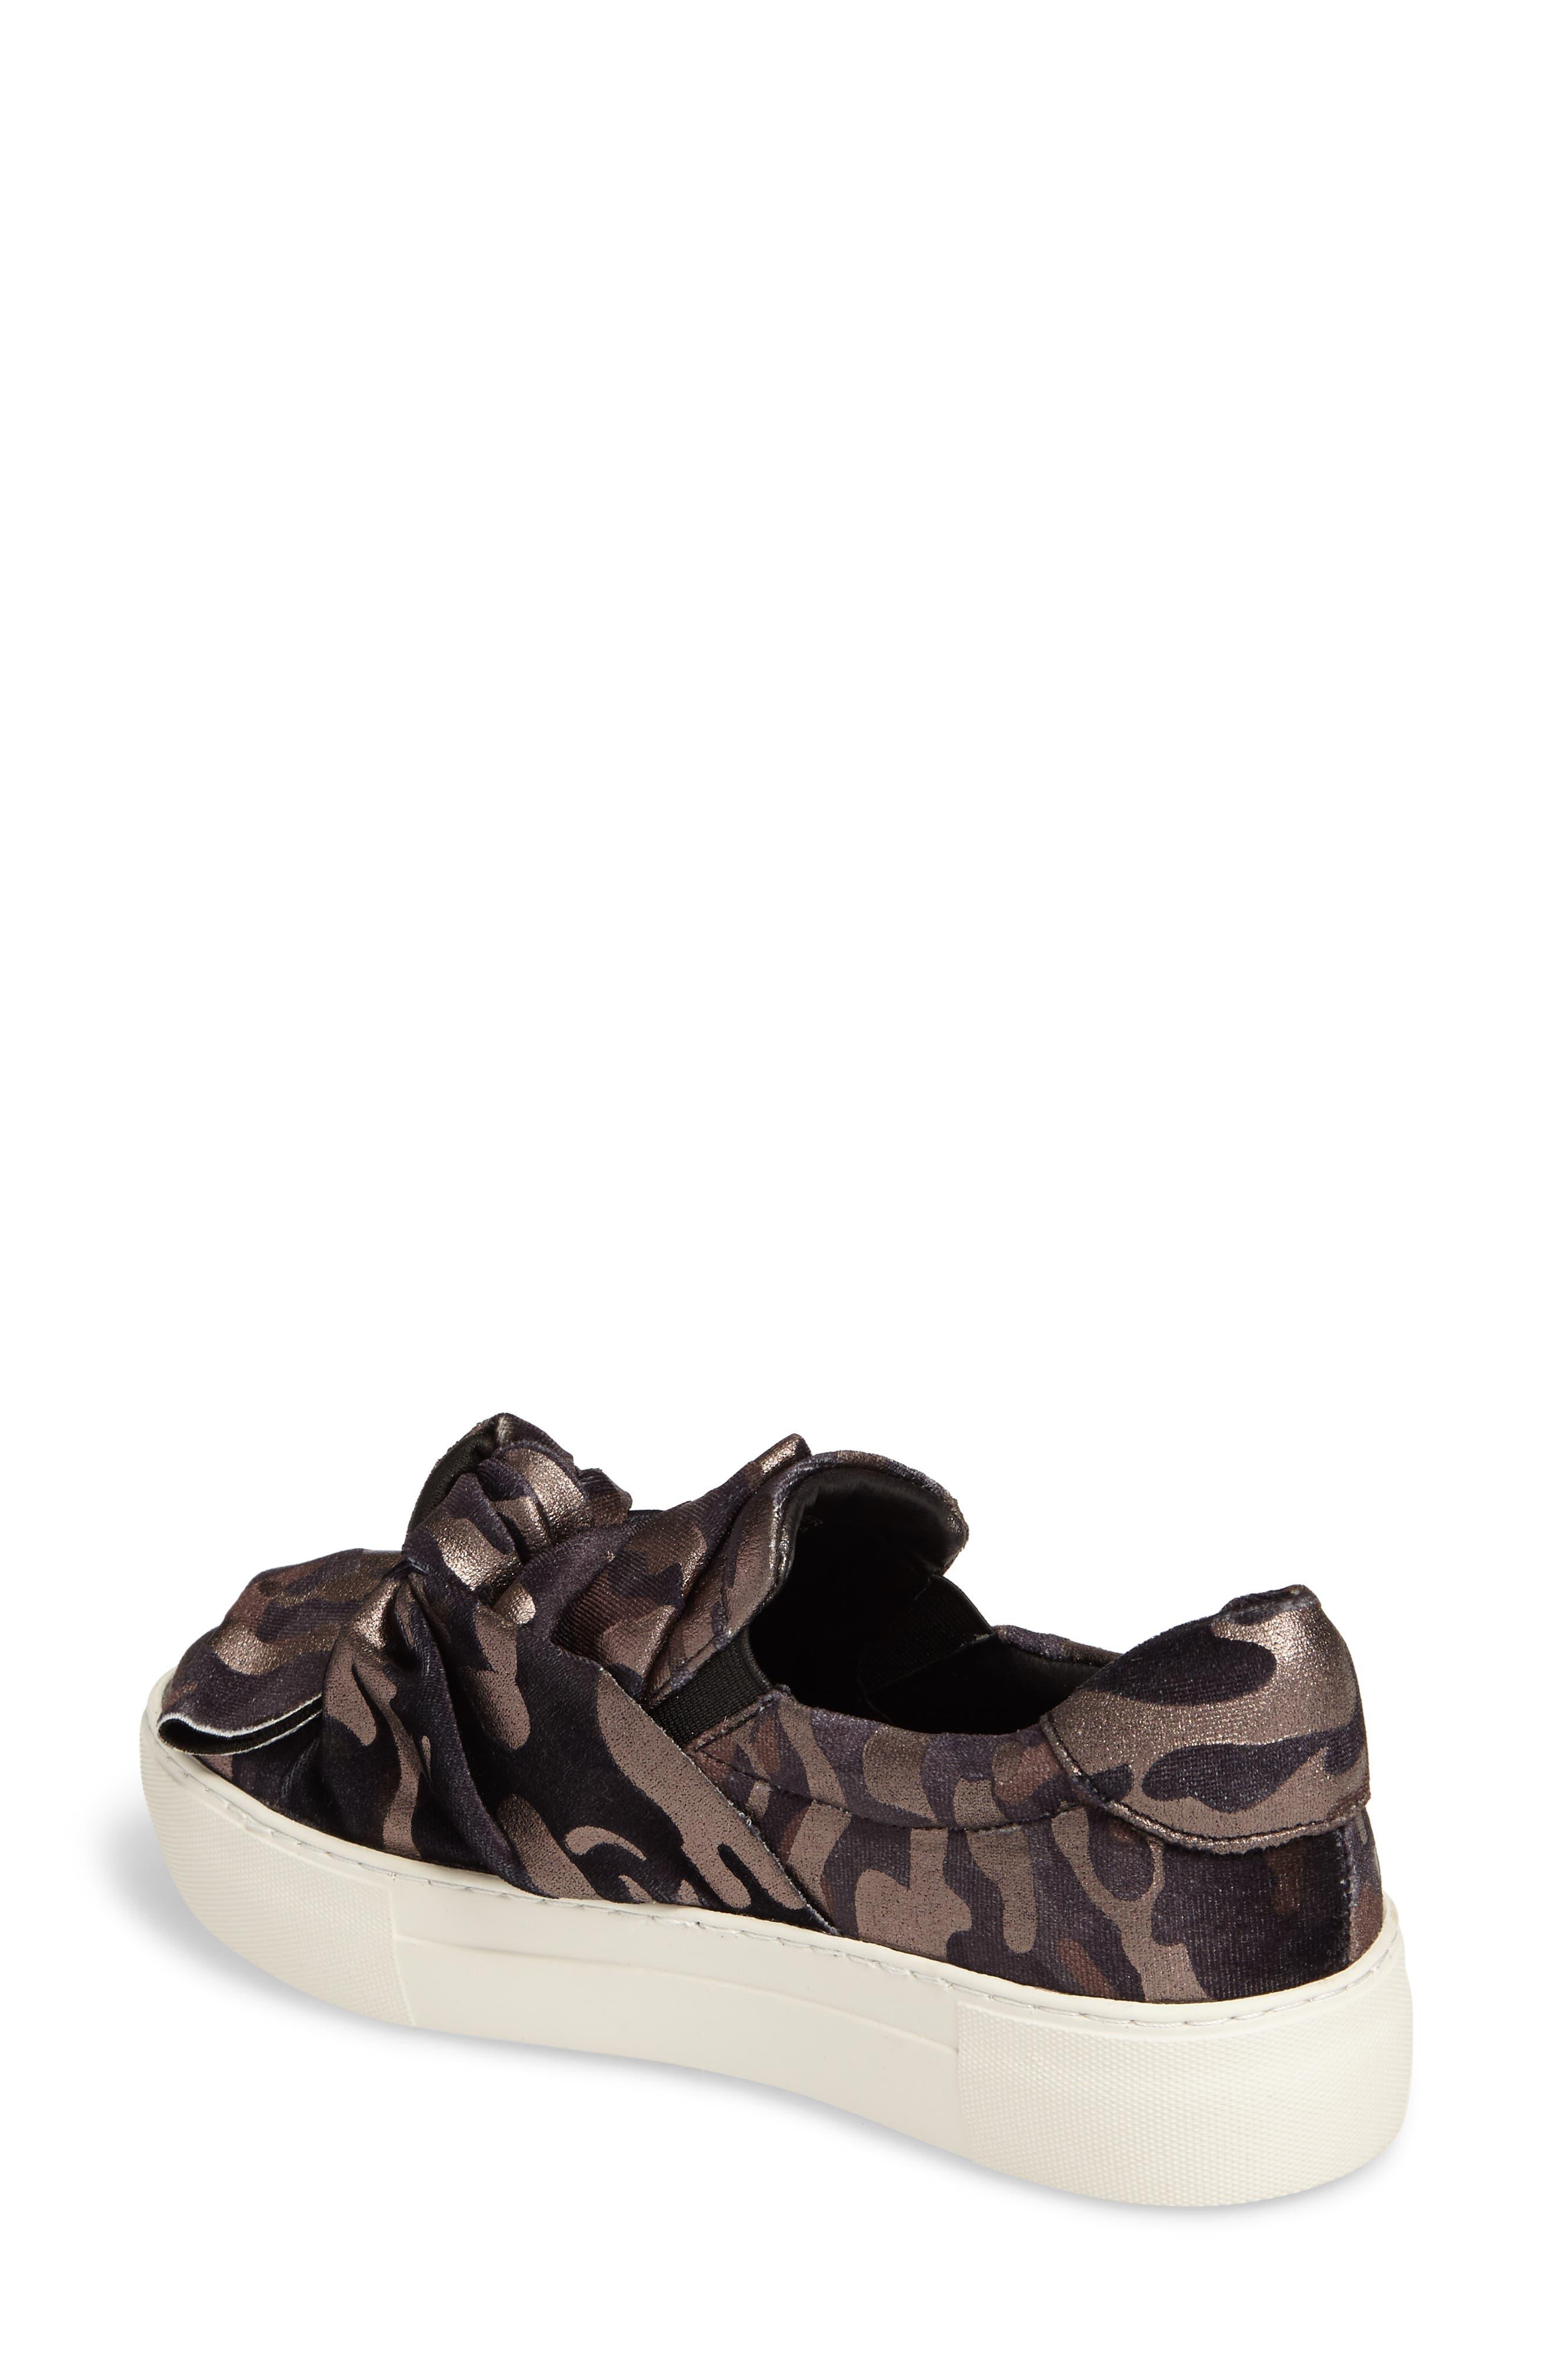 Audra Slip-On Sneaker,                             Alternate thumbnail 2, color,                             Black Camo Fabric